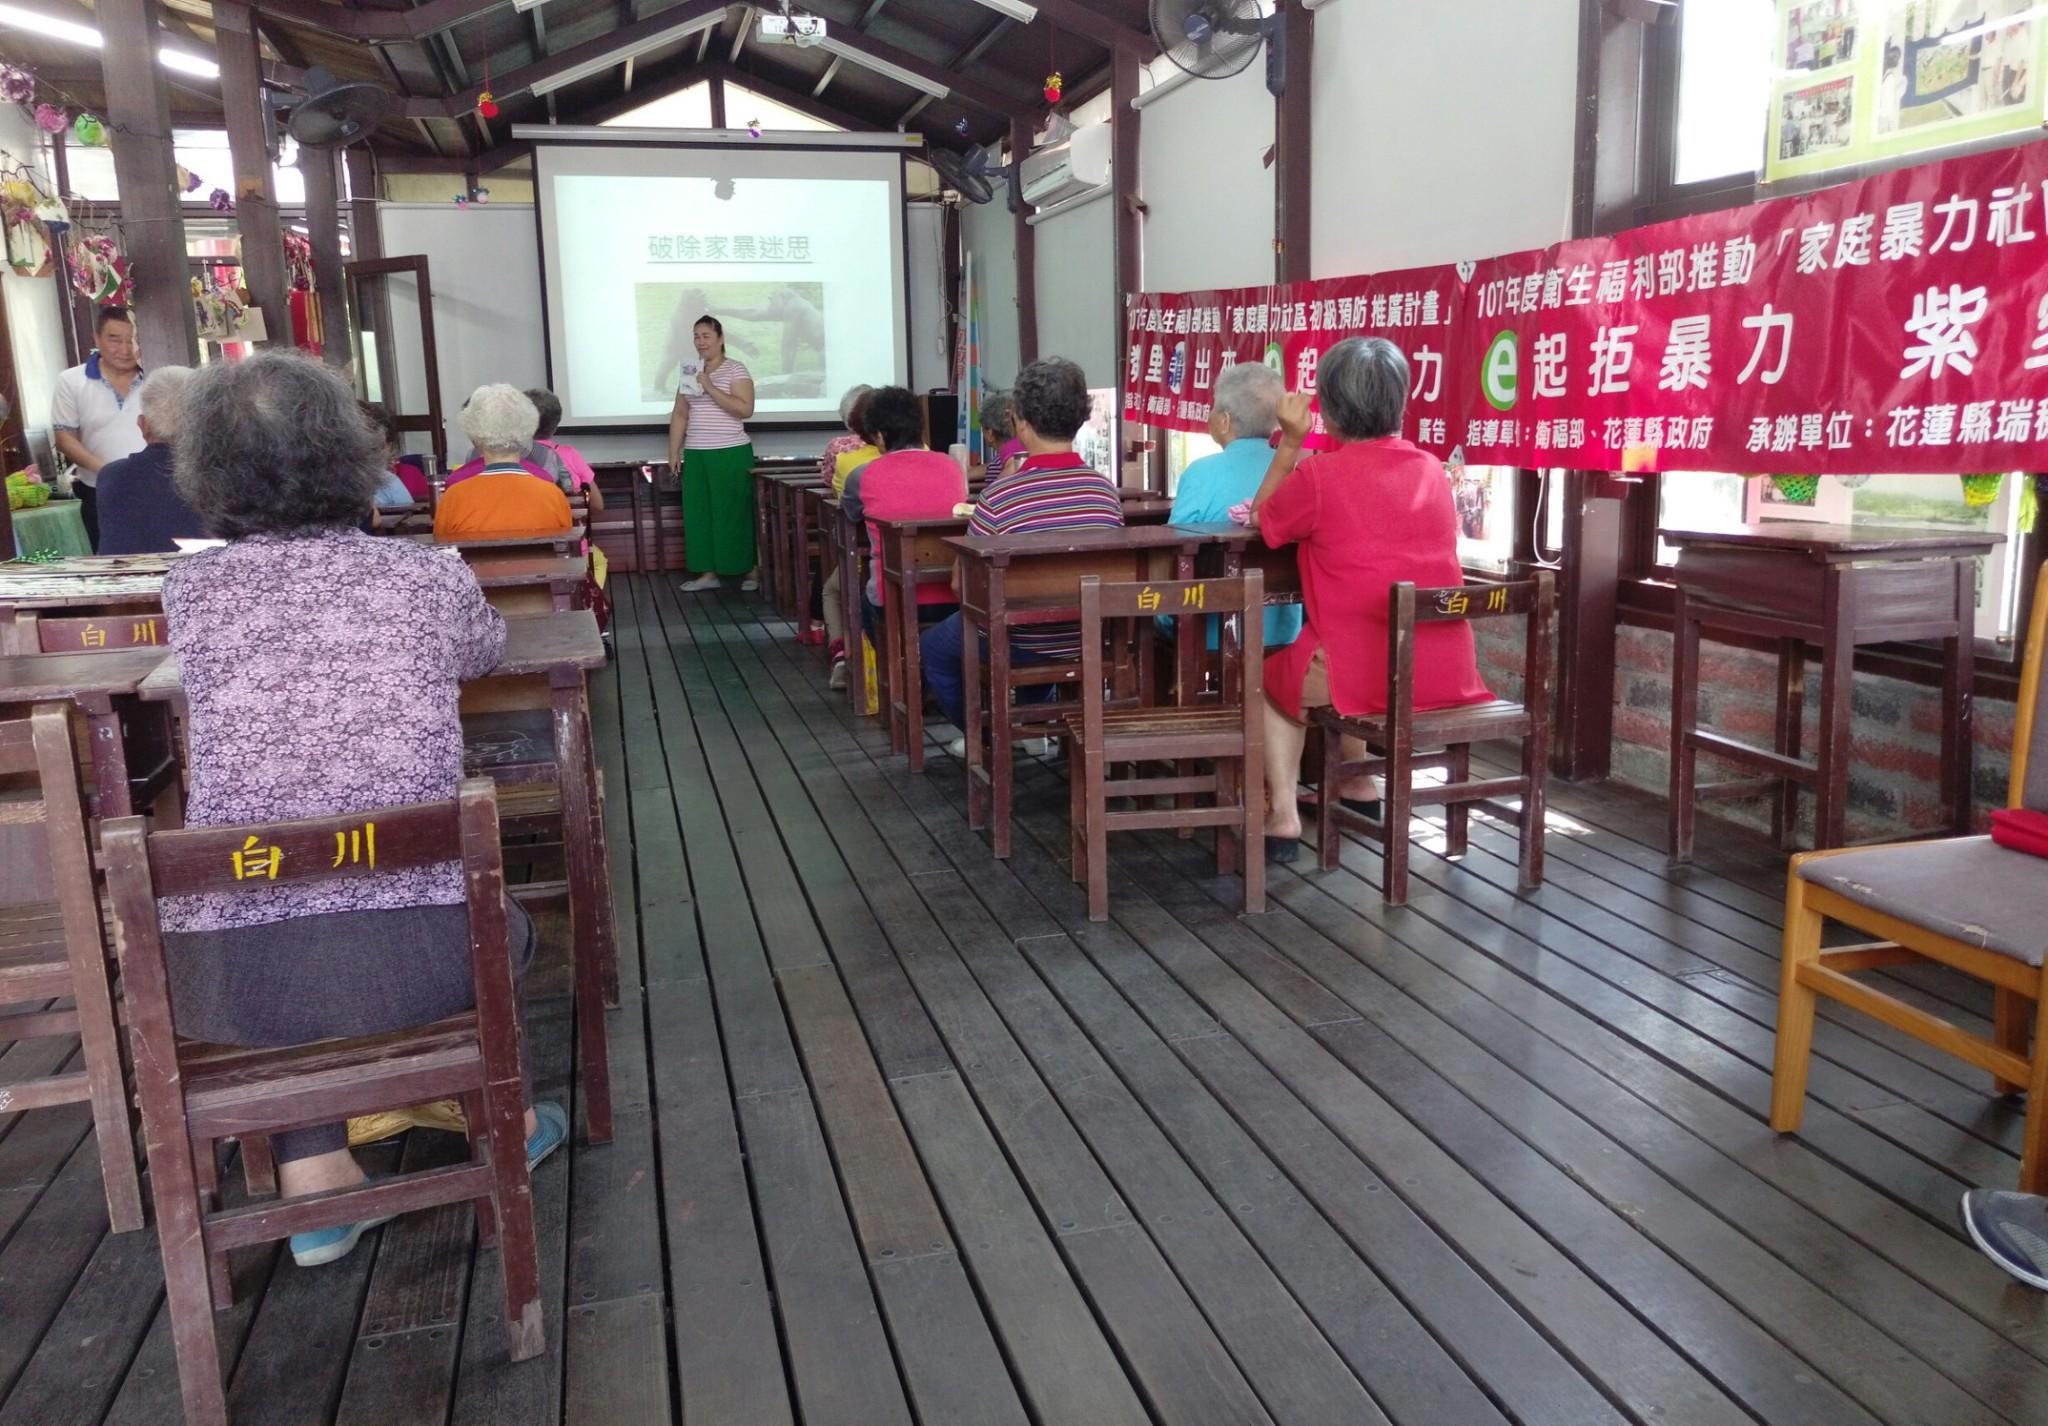 0815社區培力課程